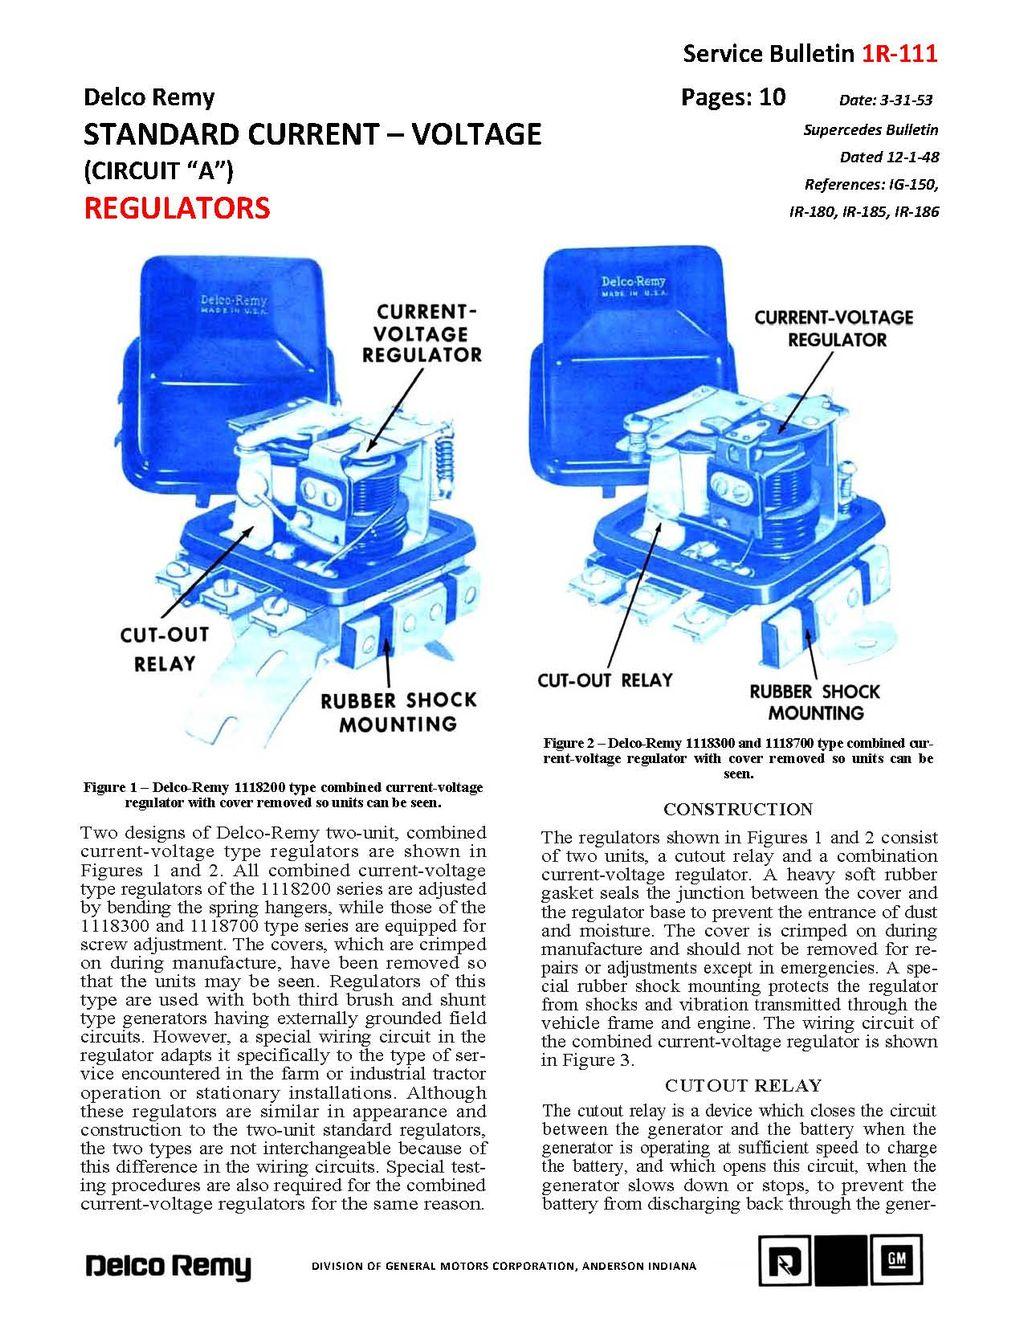 Delco Remy Voltage Regulator Wiring Diagram from www.hydra-glide.net